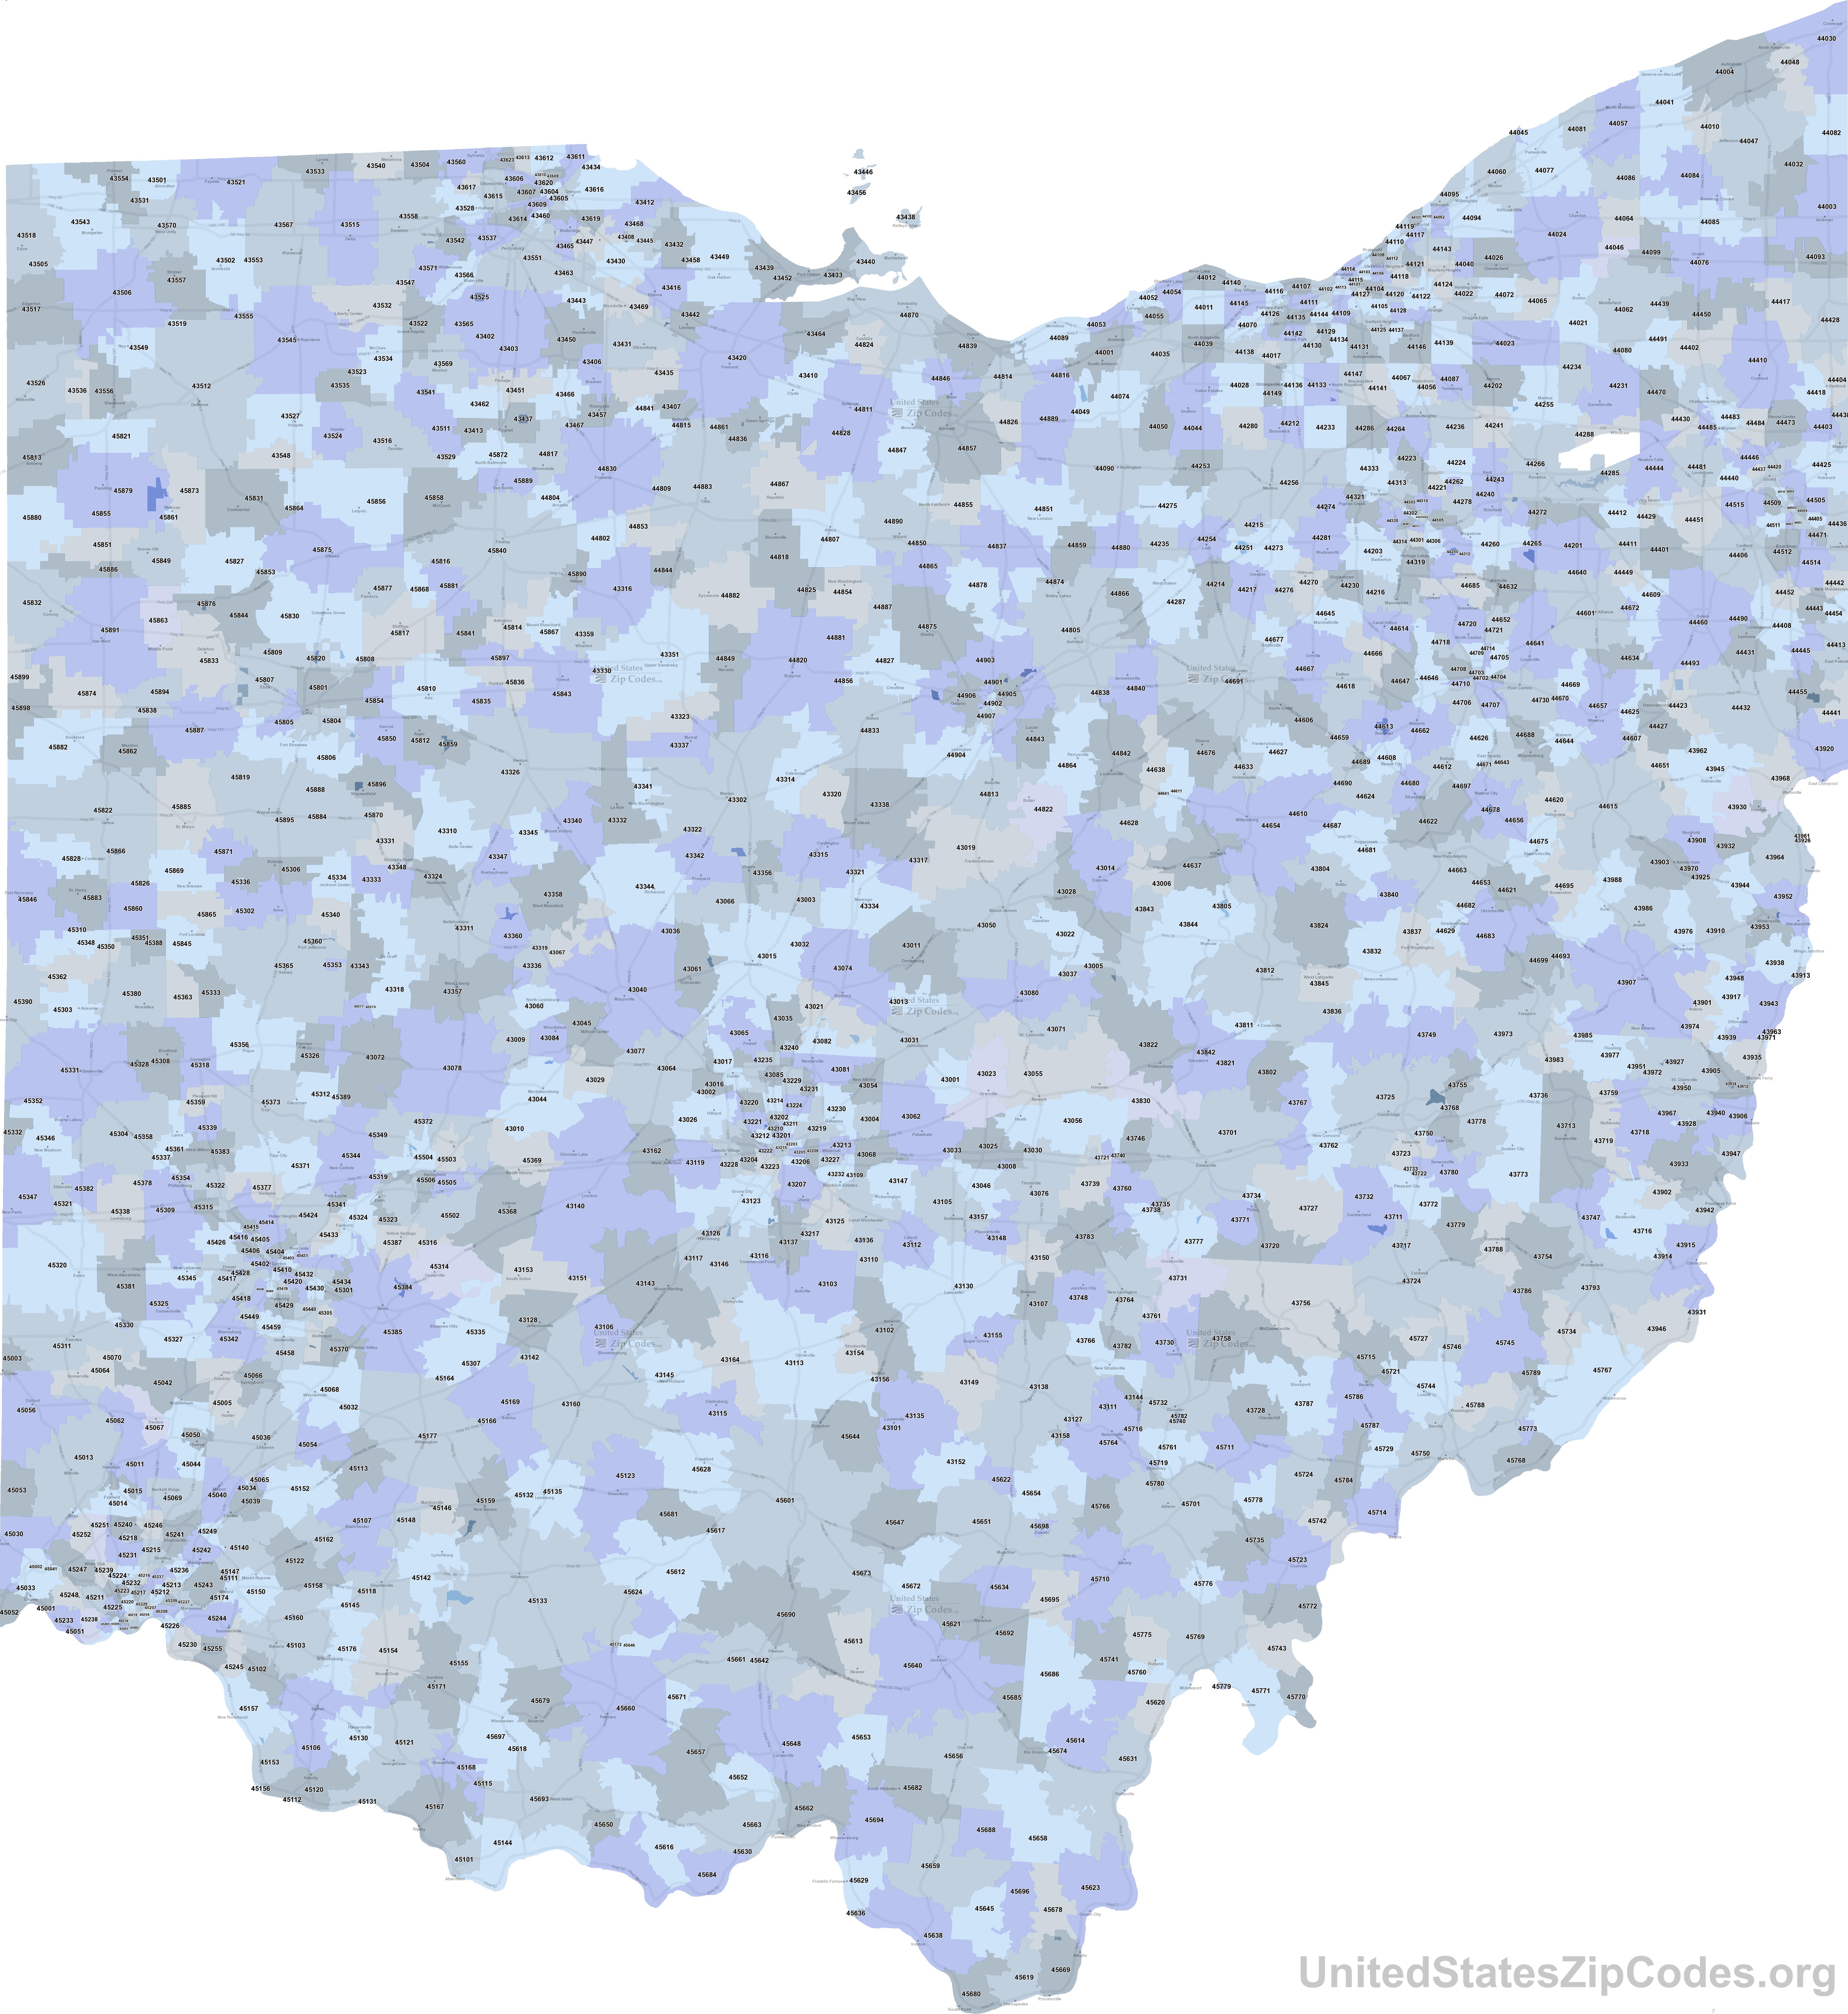 Printable ZIP Code Maps Free Download